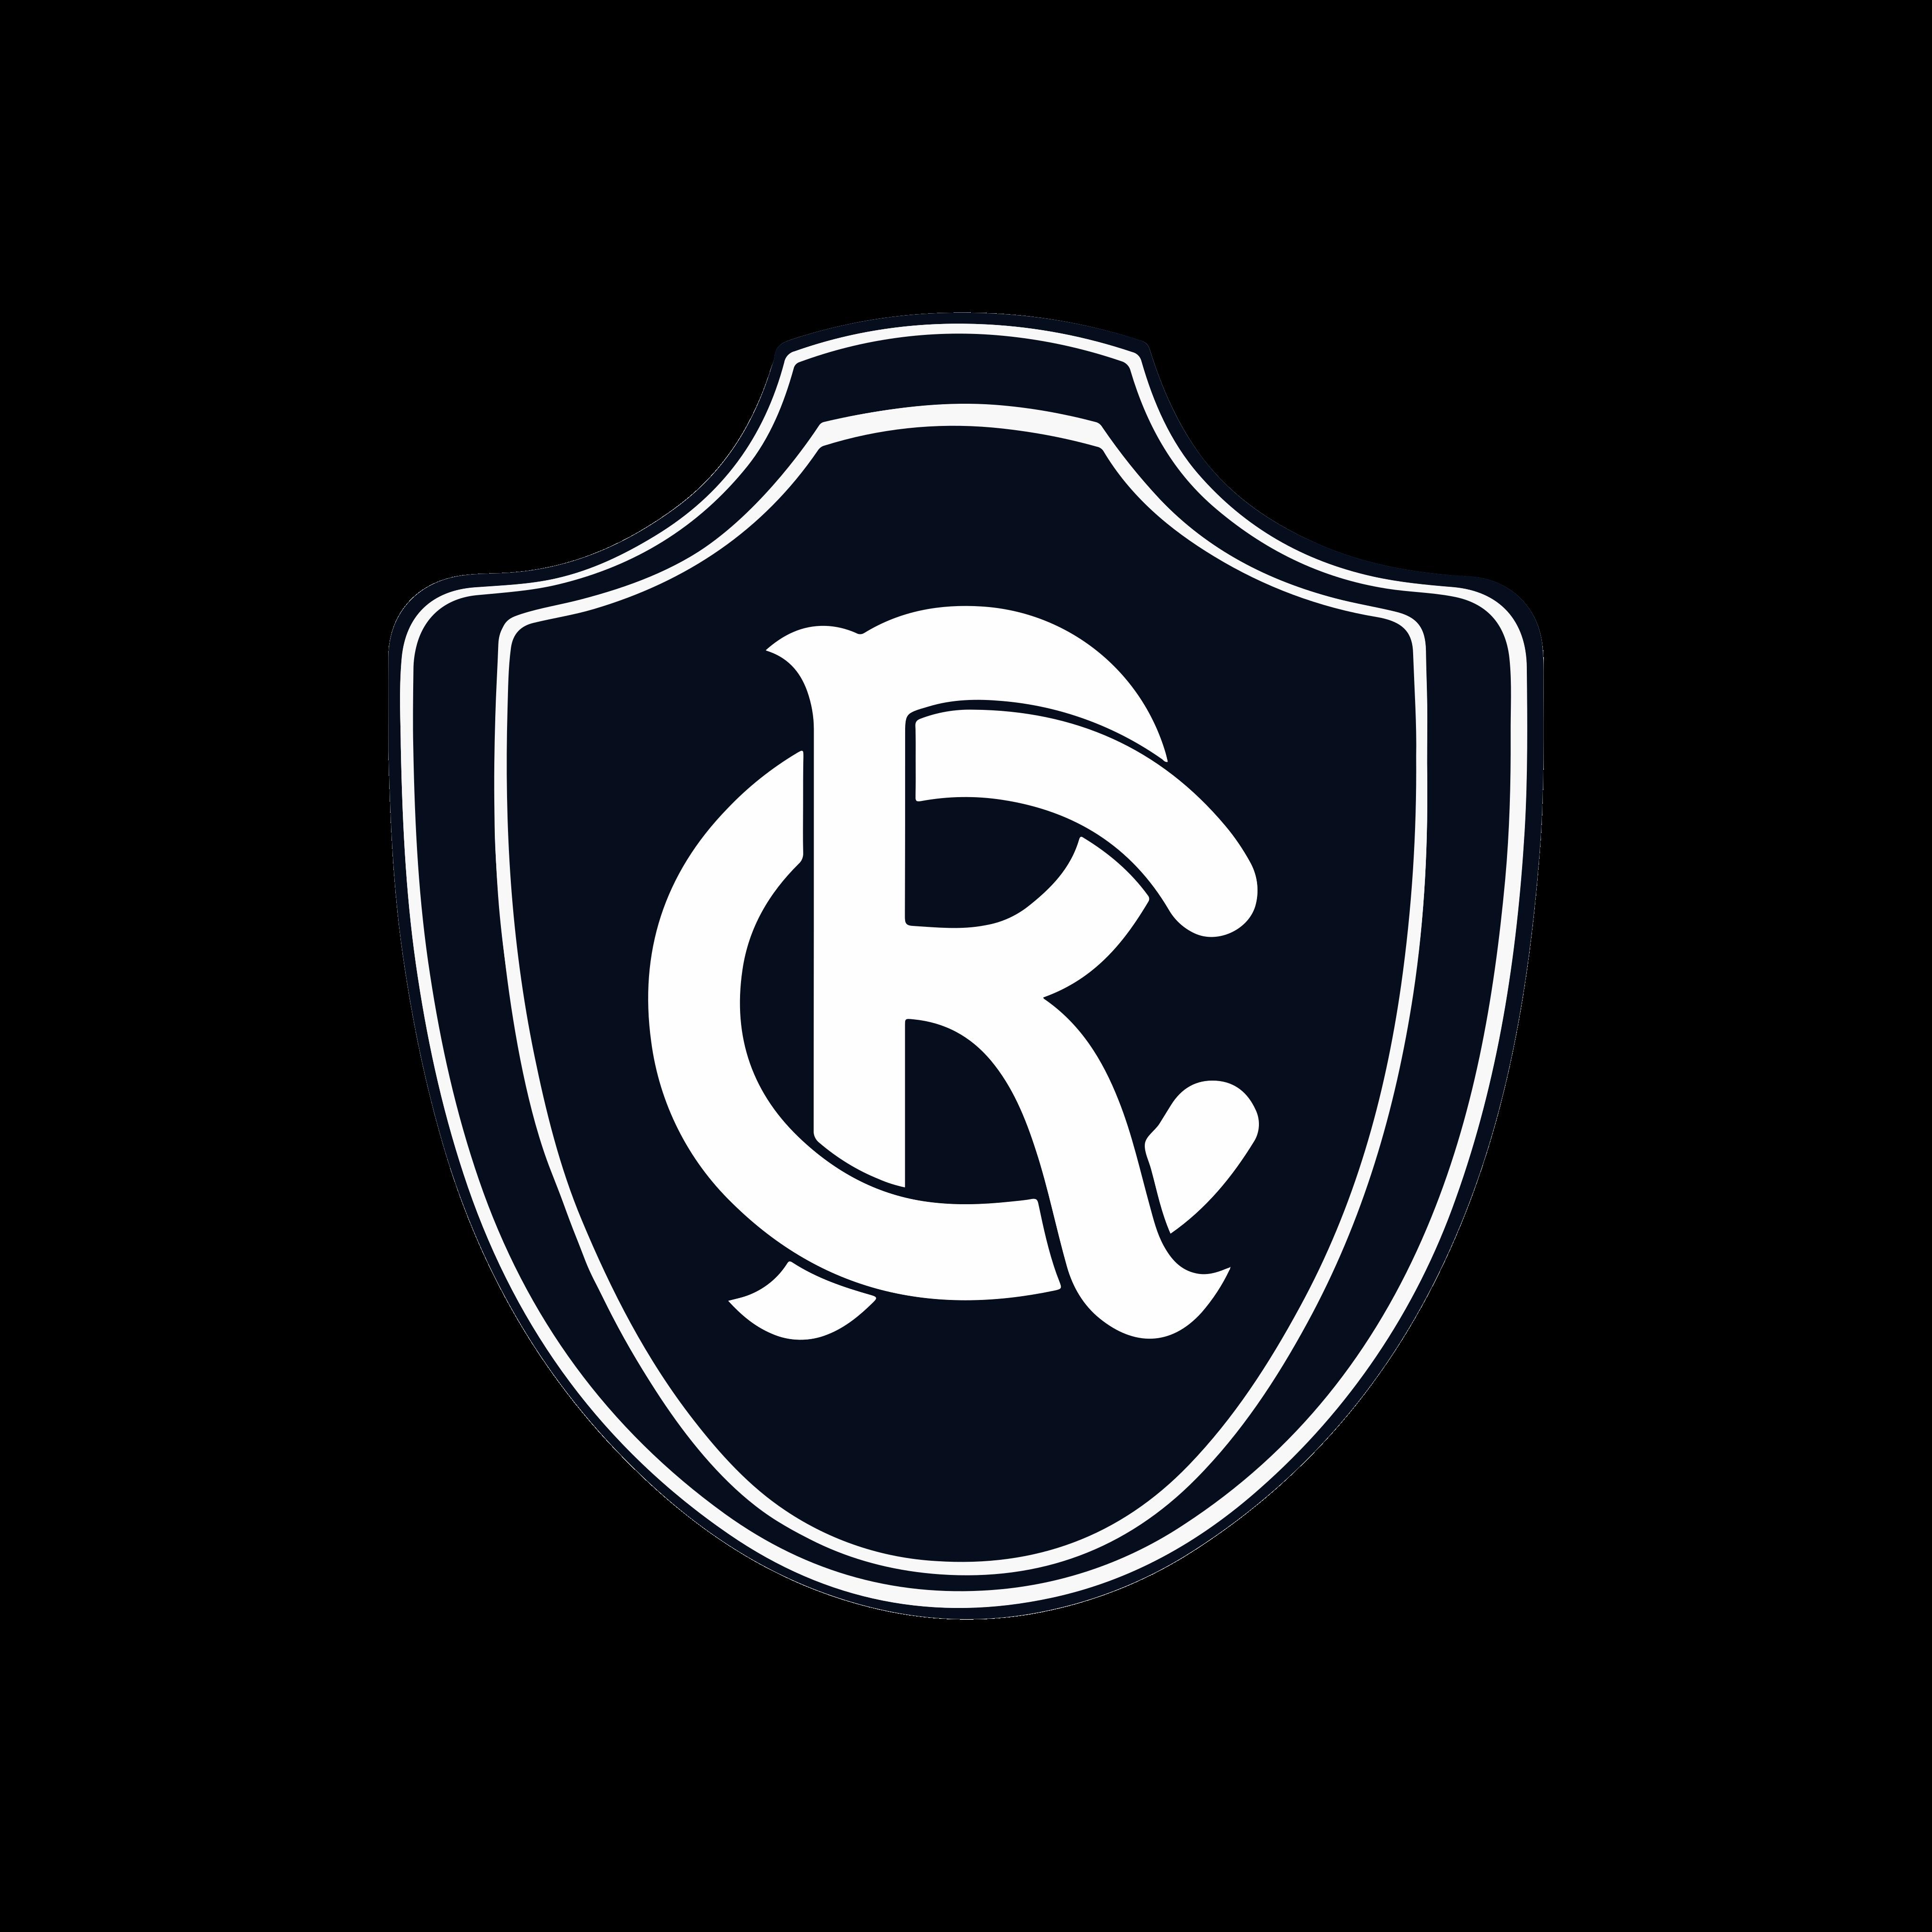 remo logo 0 1 - Remo Logo